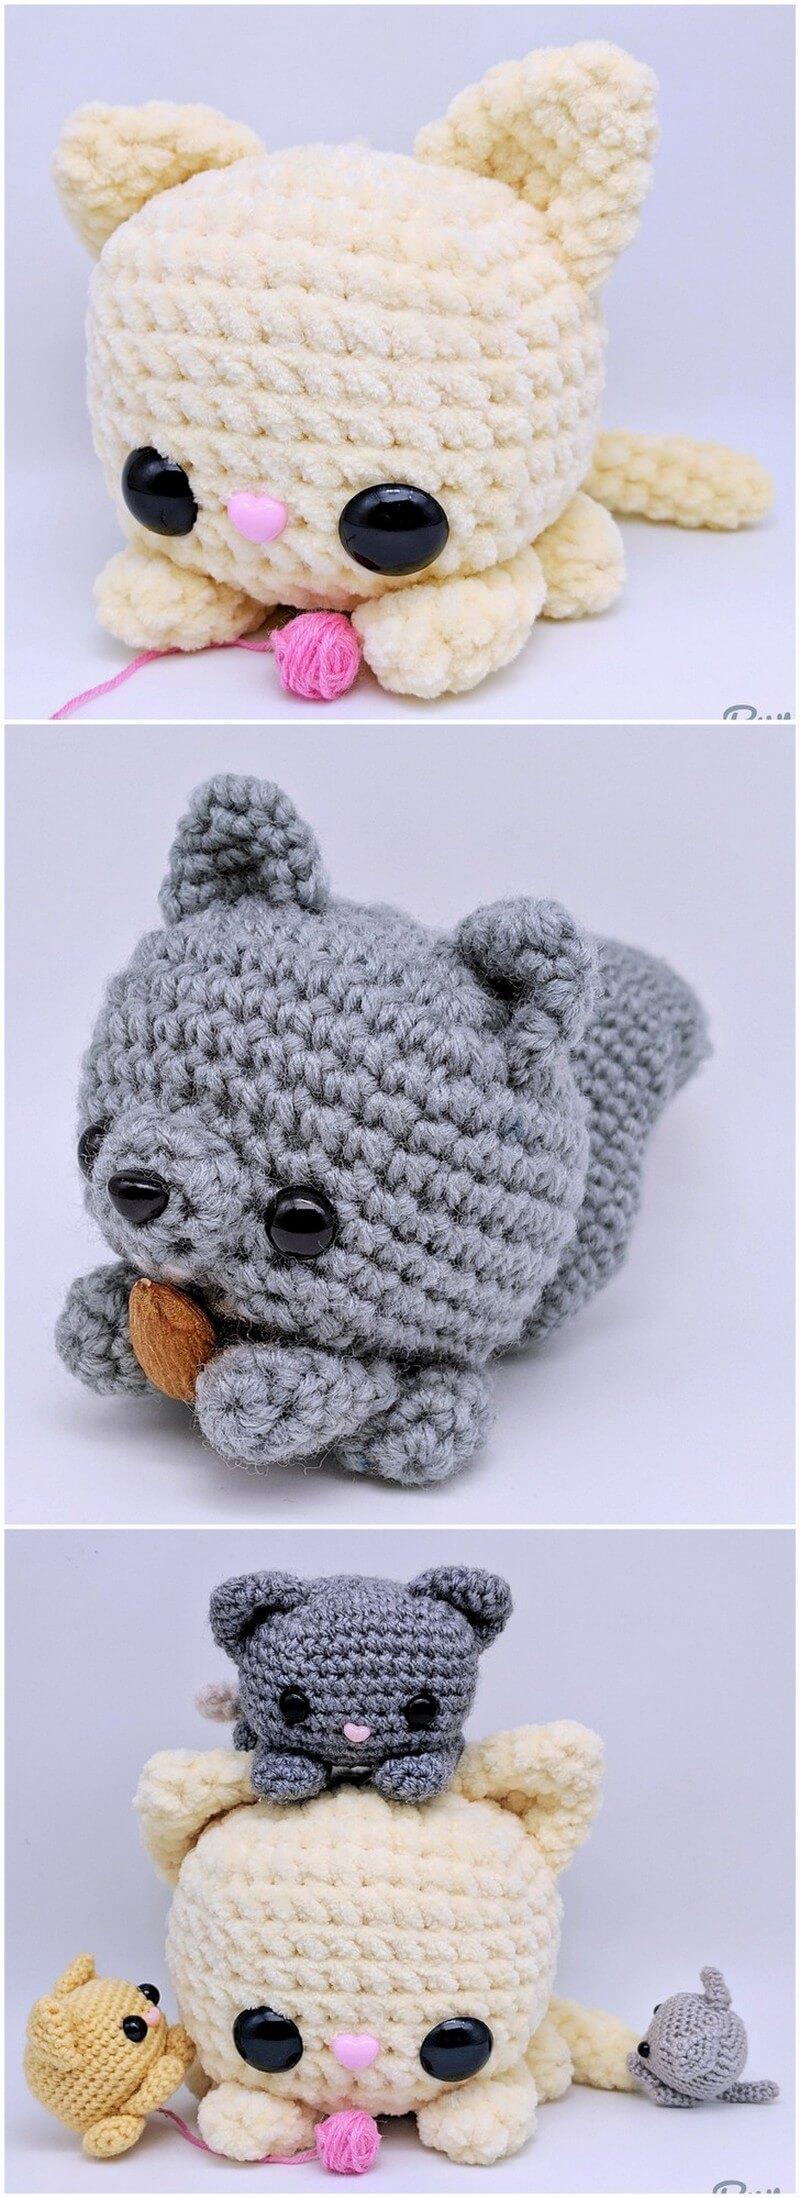 Free Crochet Amigurumi Pattern (28)